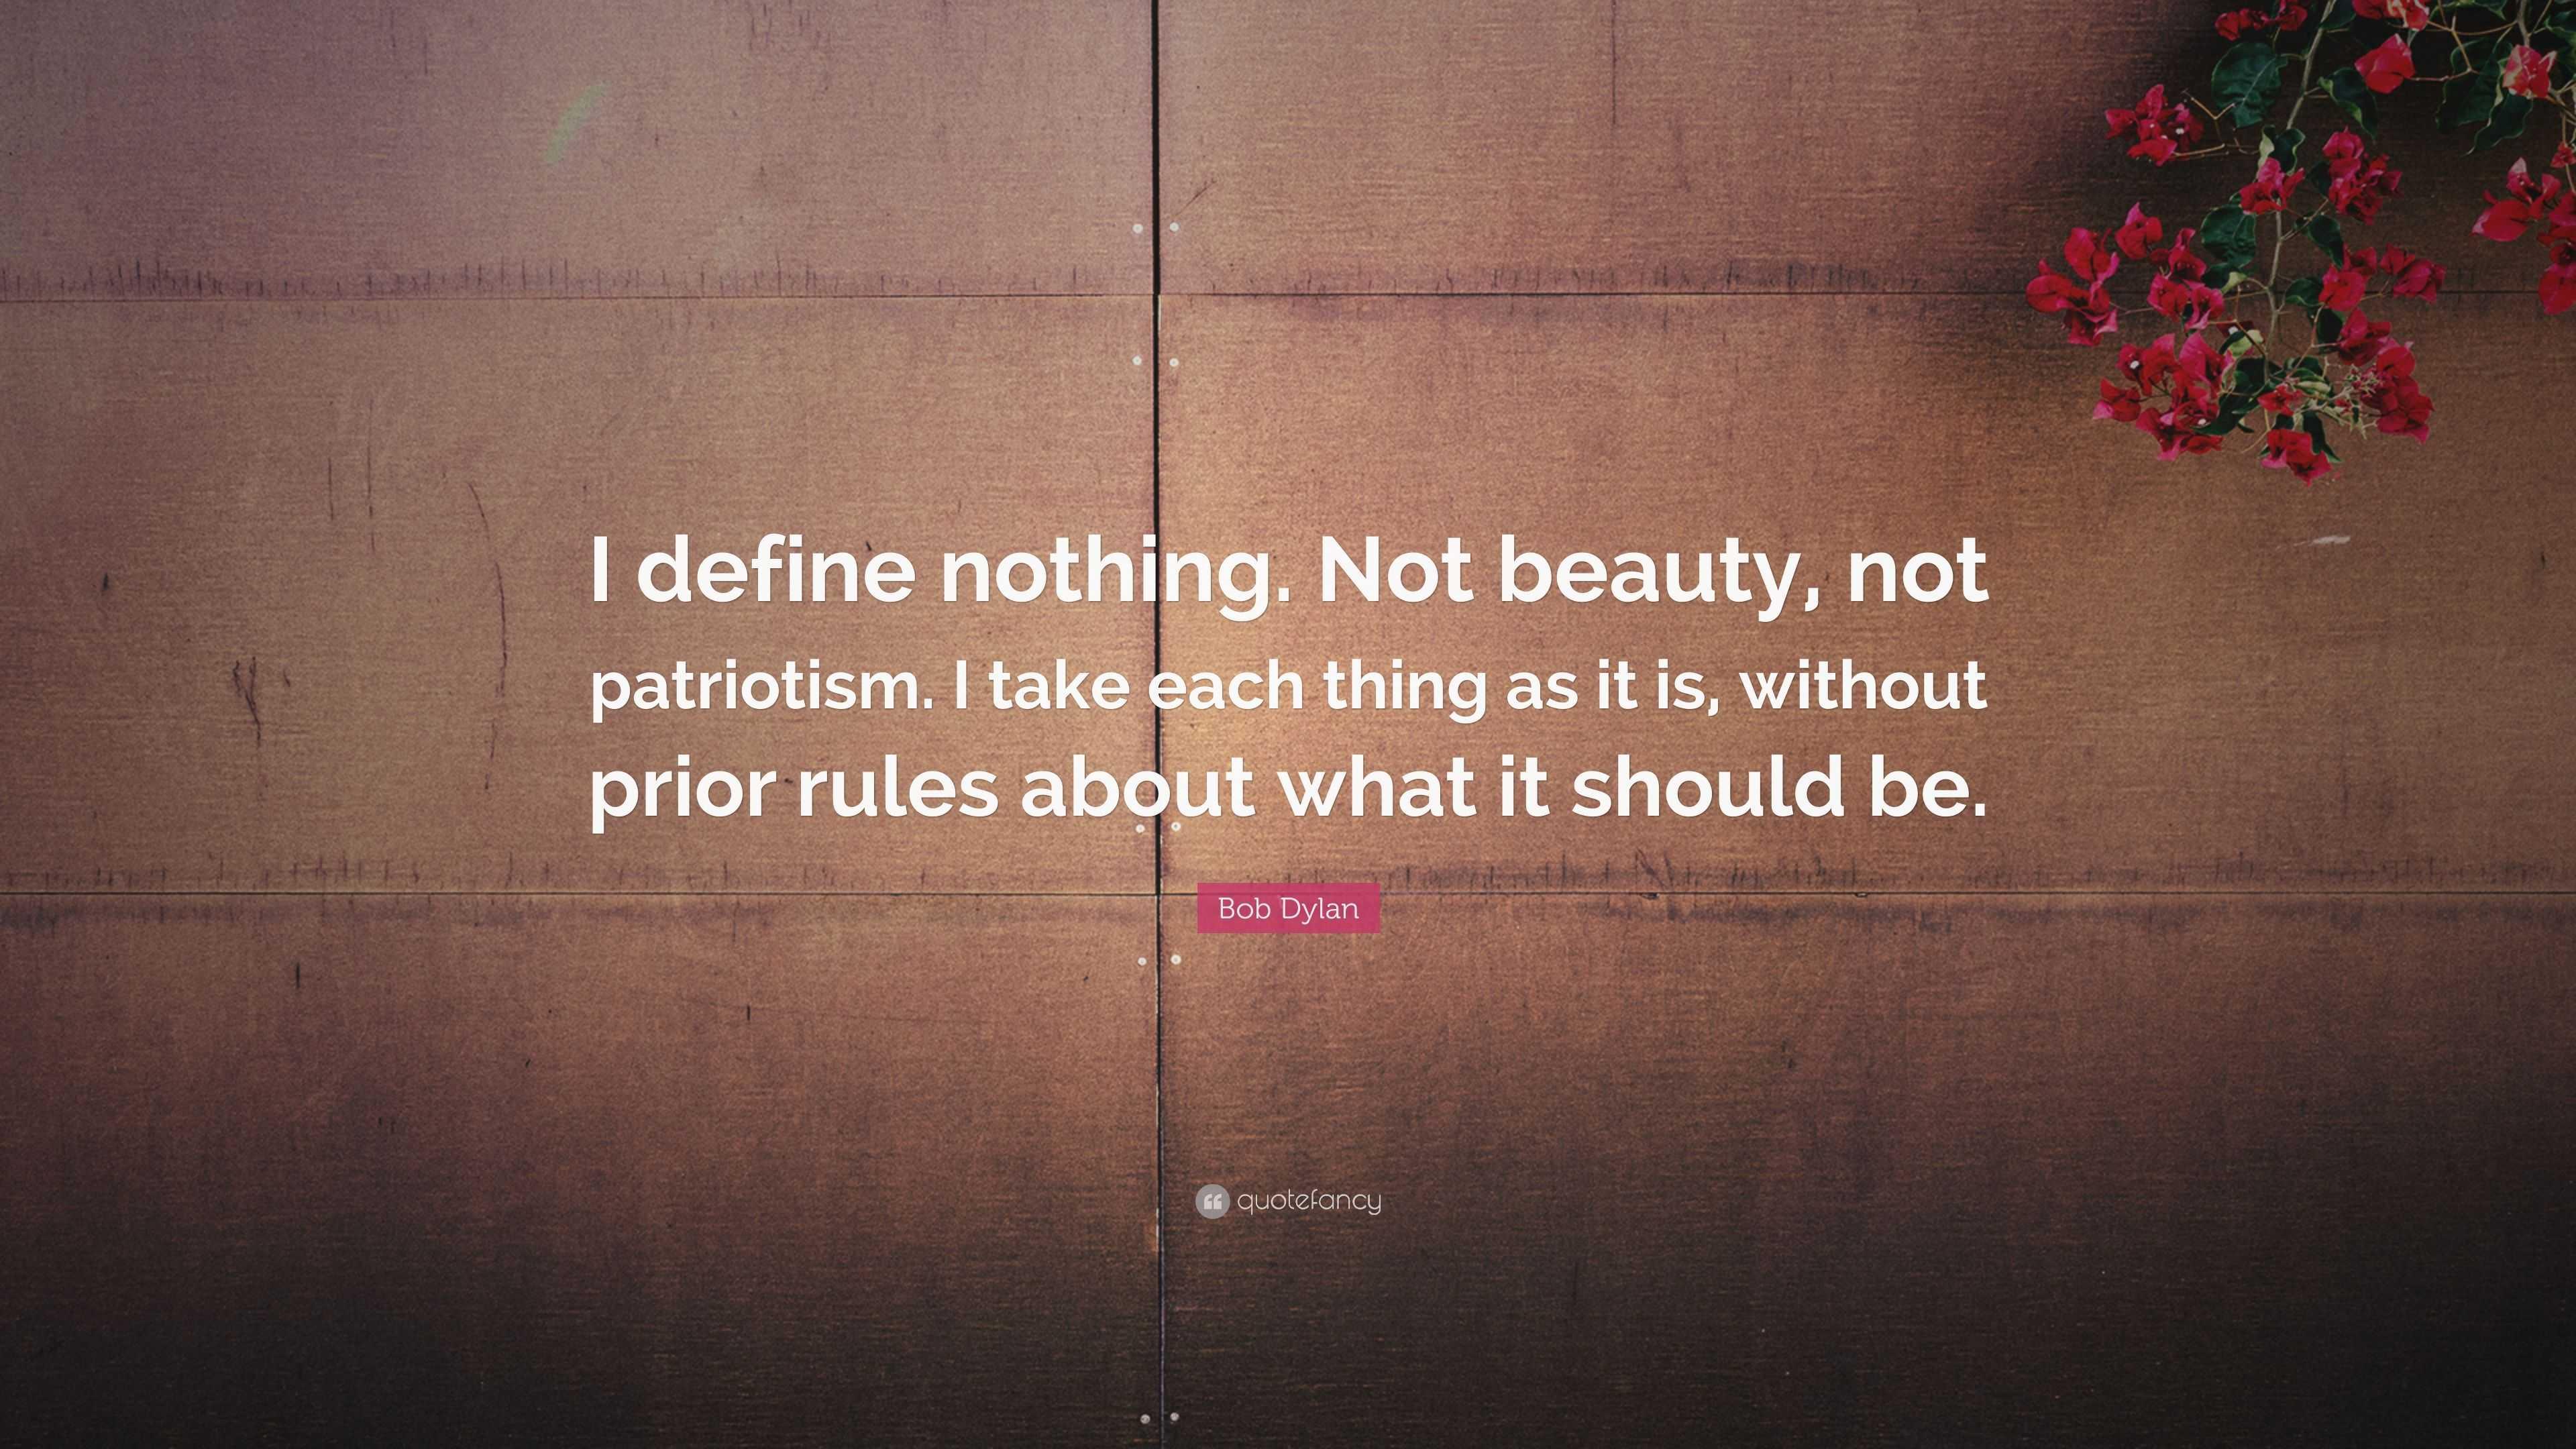 define patriotism